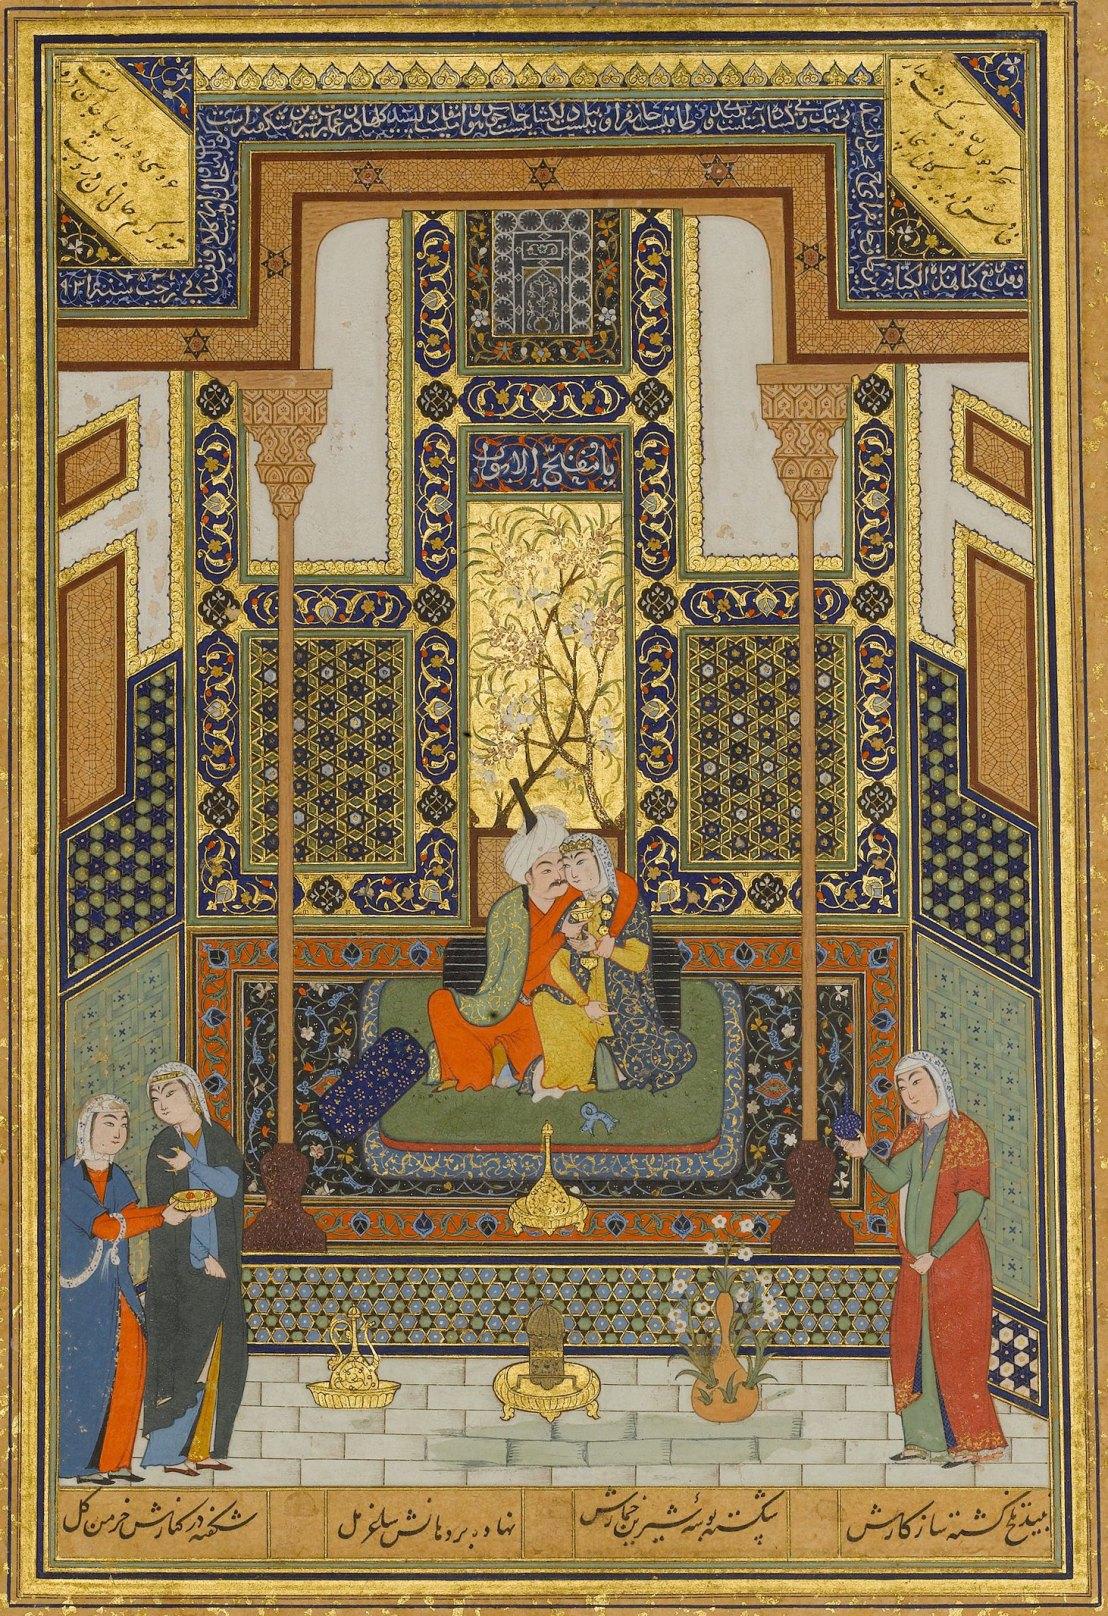 """Marriage of Khusrau and Shirin"" Folio from a Khamsa (Quintet) of Nizami. Calligrapher: Sultan Muhammad Nur (ca. 1472–ca. 1536), Artist: Painting by Shaikh Zada. present-day Afghanistan, Herat. – The Metropolitan Museum of Arts."